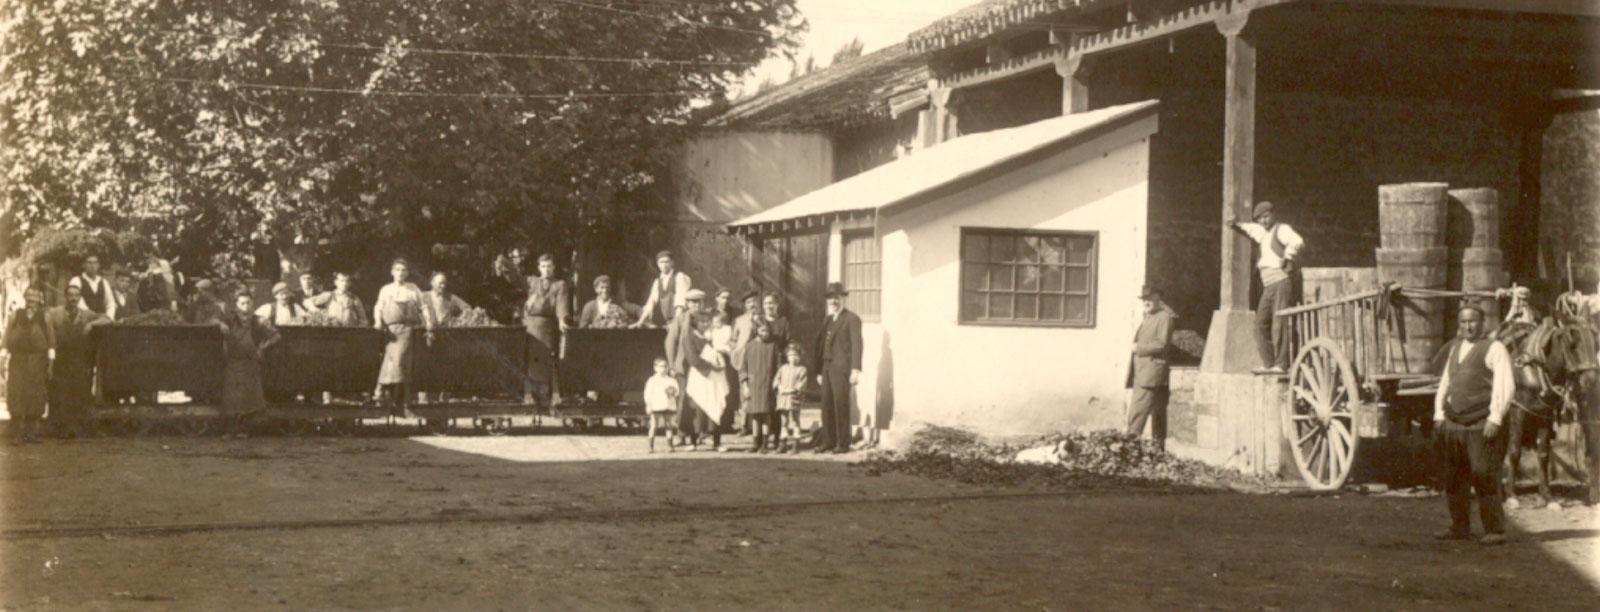 Foto histórica del personal de CVNE